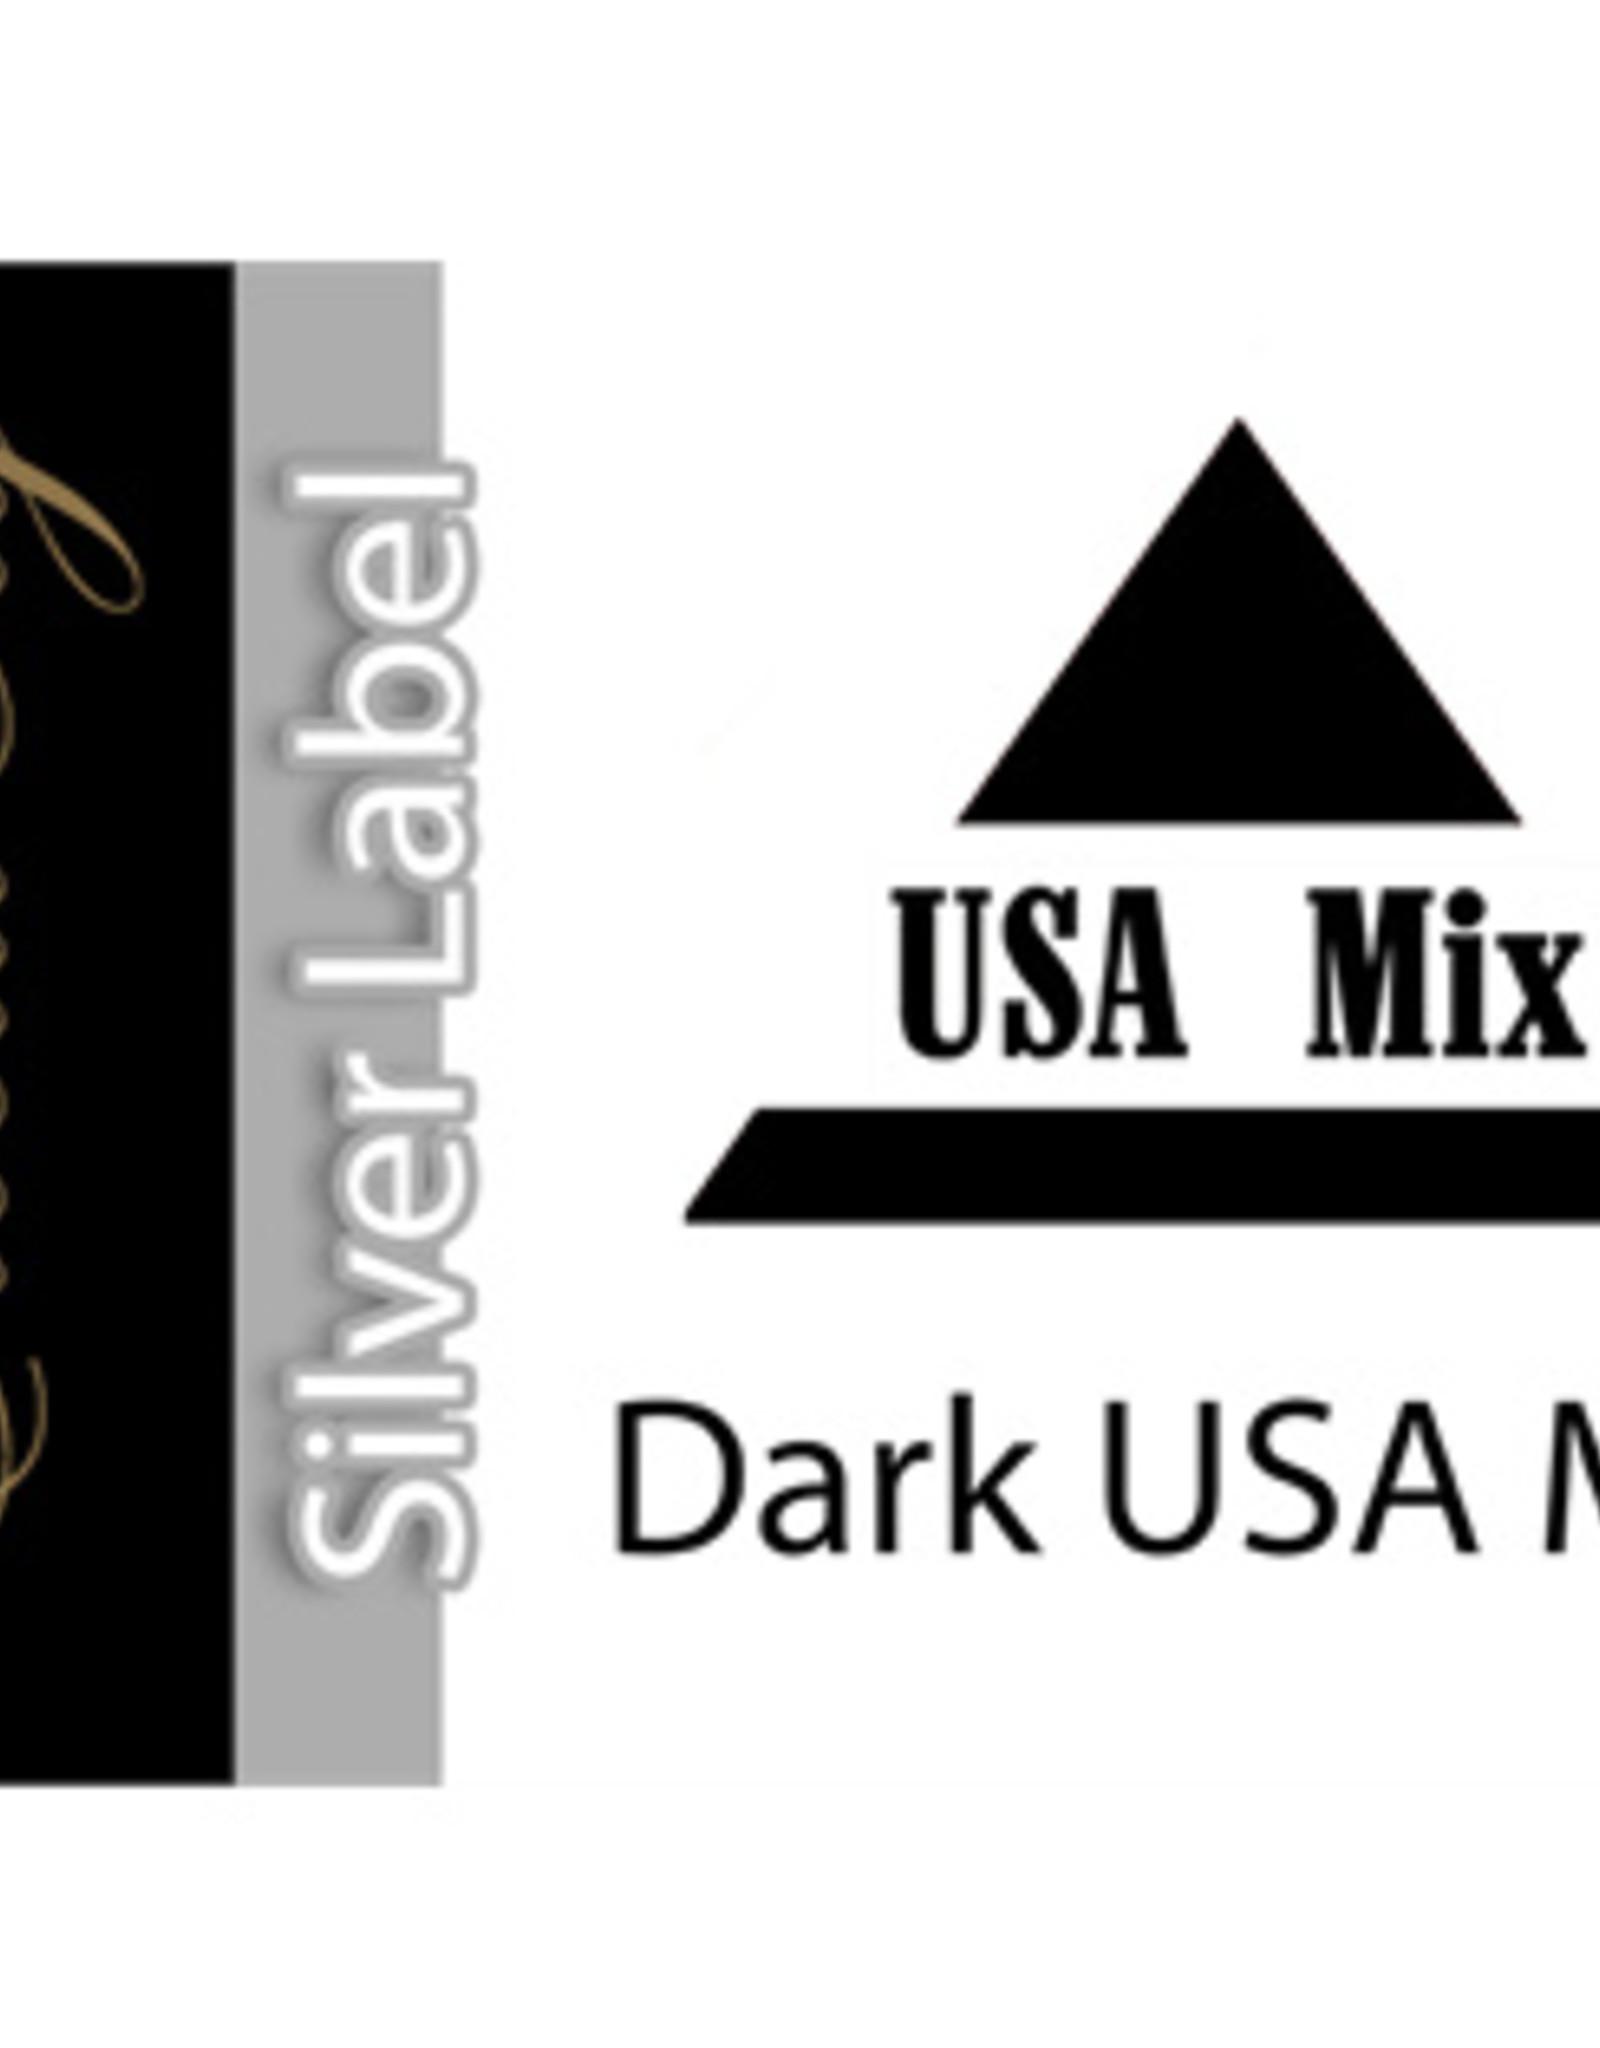 Exclucig Exclucig Silver Label E-liquid Dark USA Mix 18 mg Nicotine